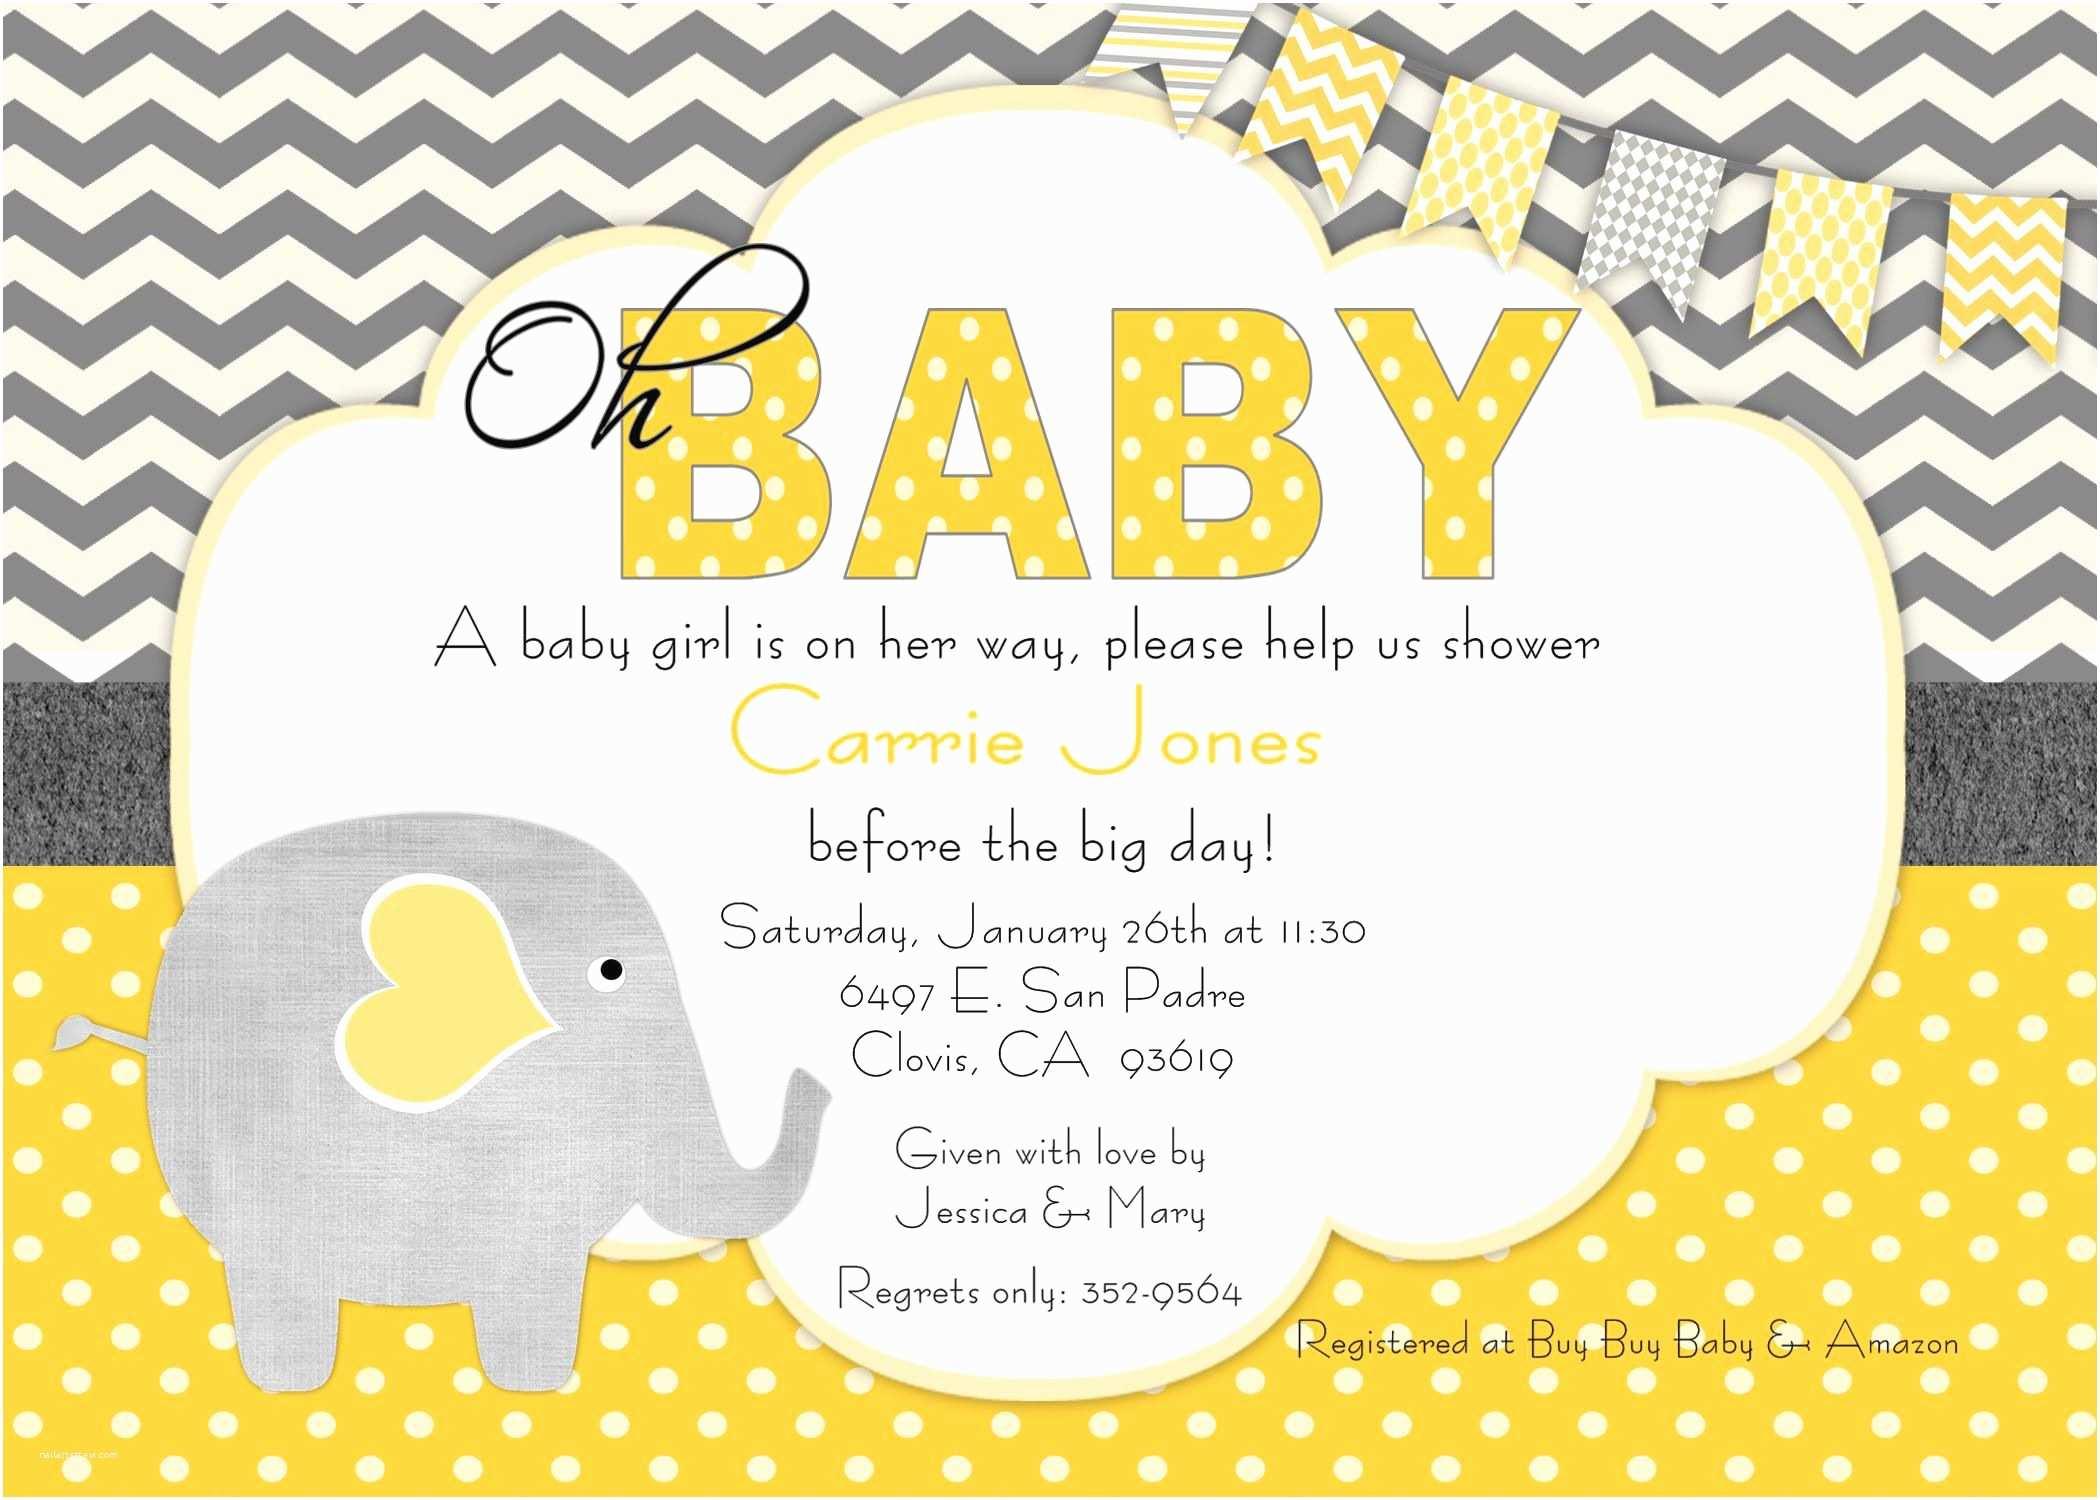 Baby Shower Invitation Templates Baby Shower Invitation Free Baby Shower Invitation